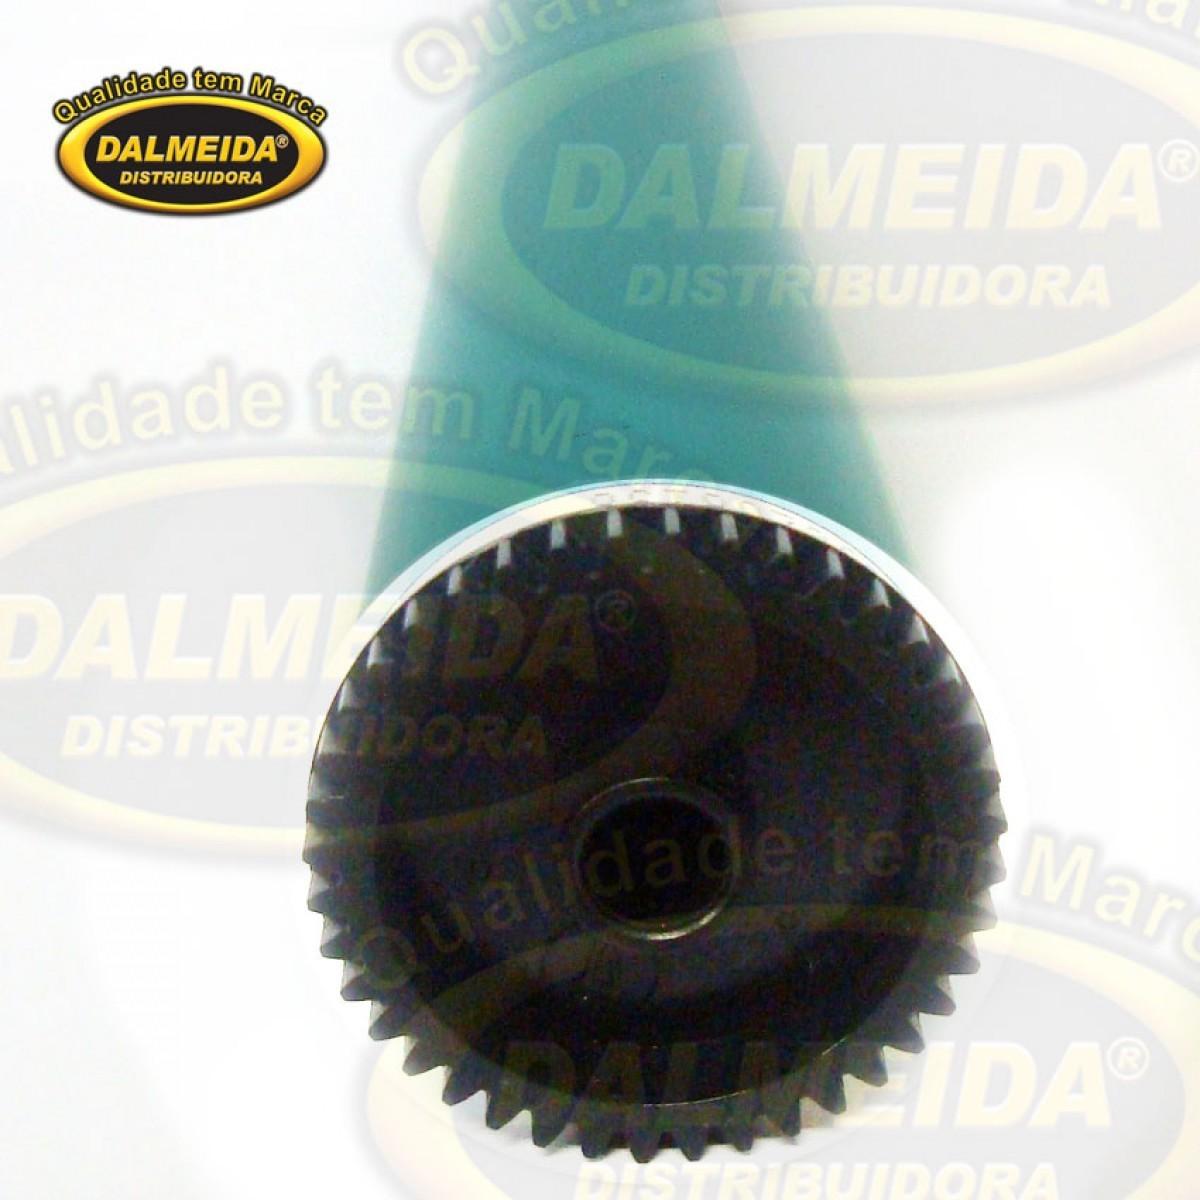 CILINDRO D105 1910/4600/2850/2525/2581 (SAMSUNG SCX 4600/23/3220/ML2850/1910/1911/1915/2525/2581/2580/4600/4601/4606/4623/4828CF-650)